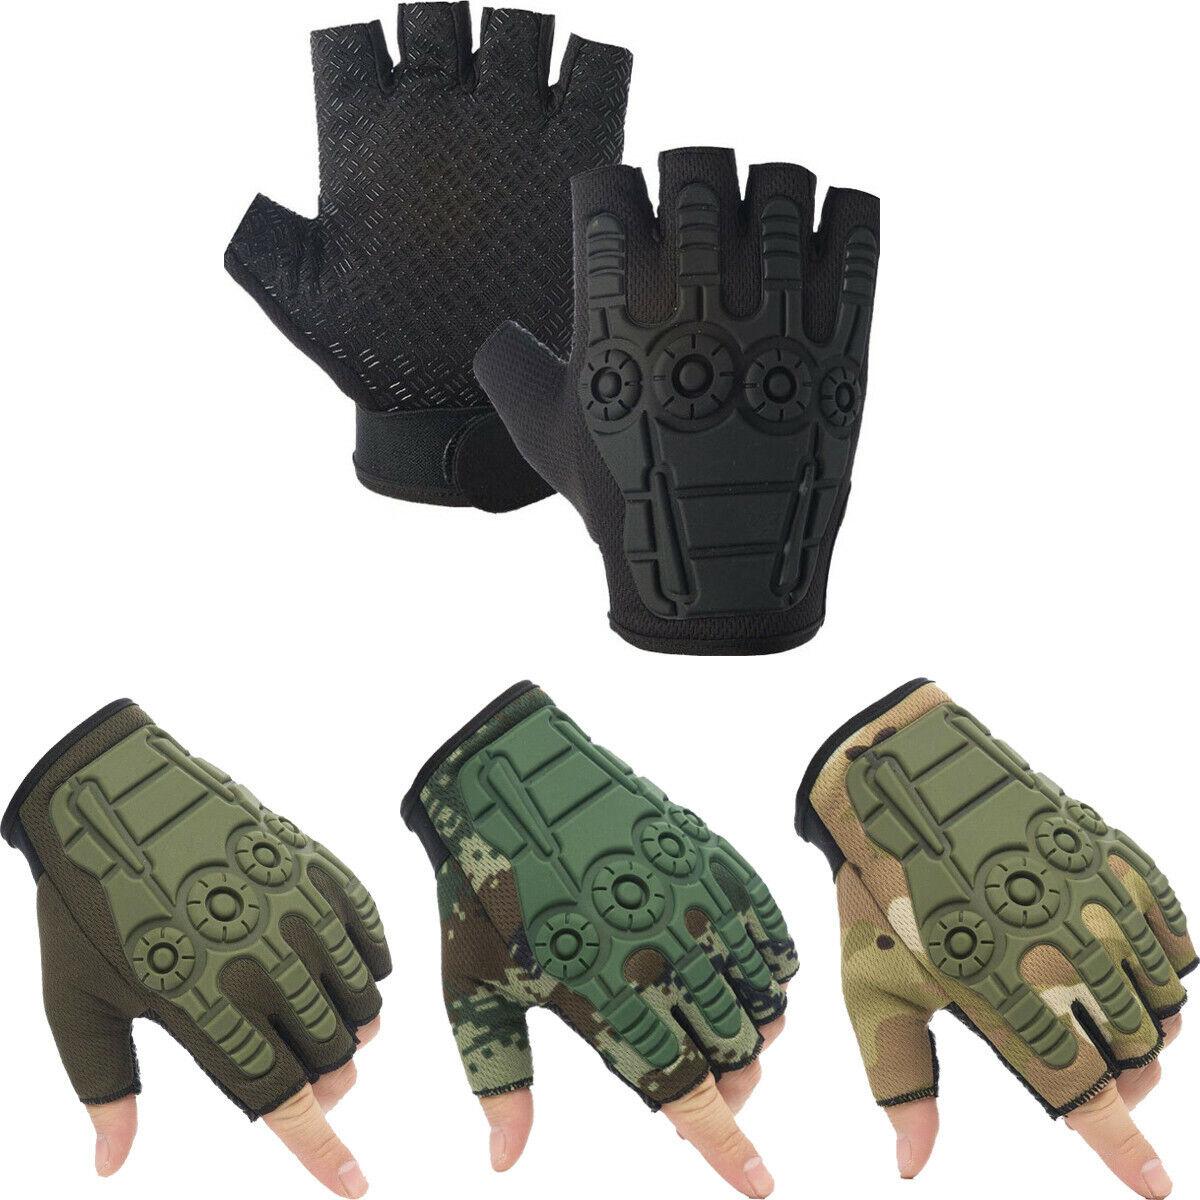 Tactical Hard Knuckle Half Finger Gloves Men Army Military Assault Combat